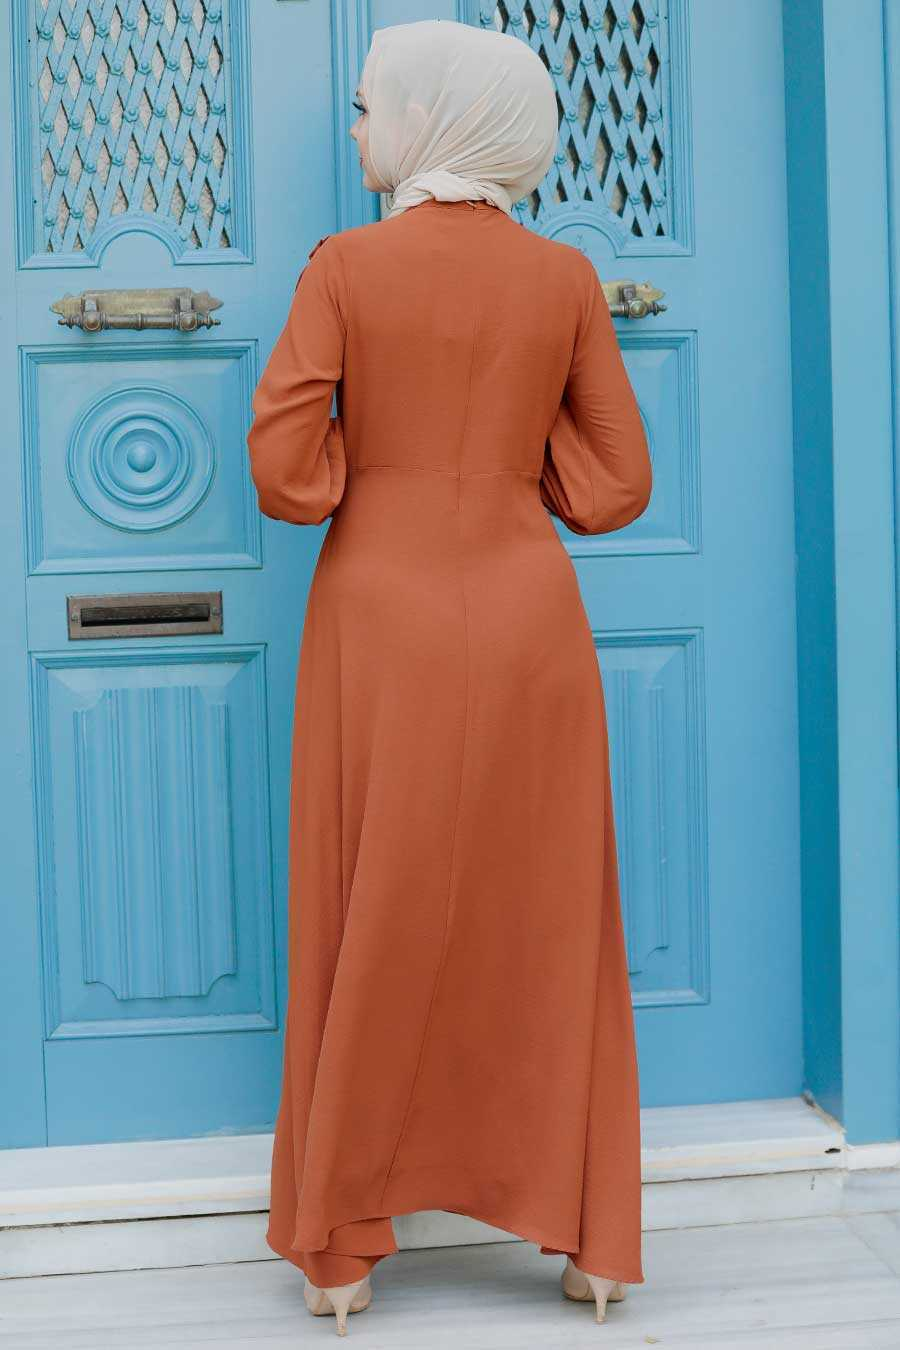 Sunuff Colored Hijab Dress 76480TB